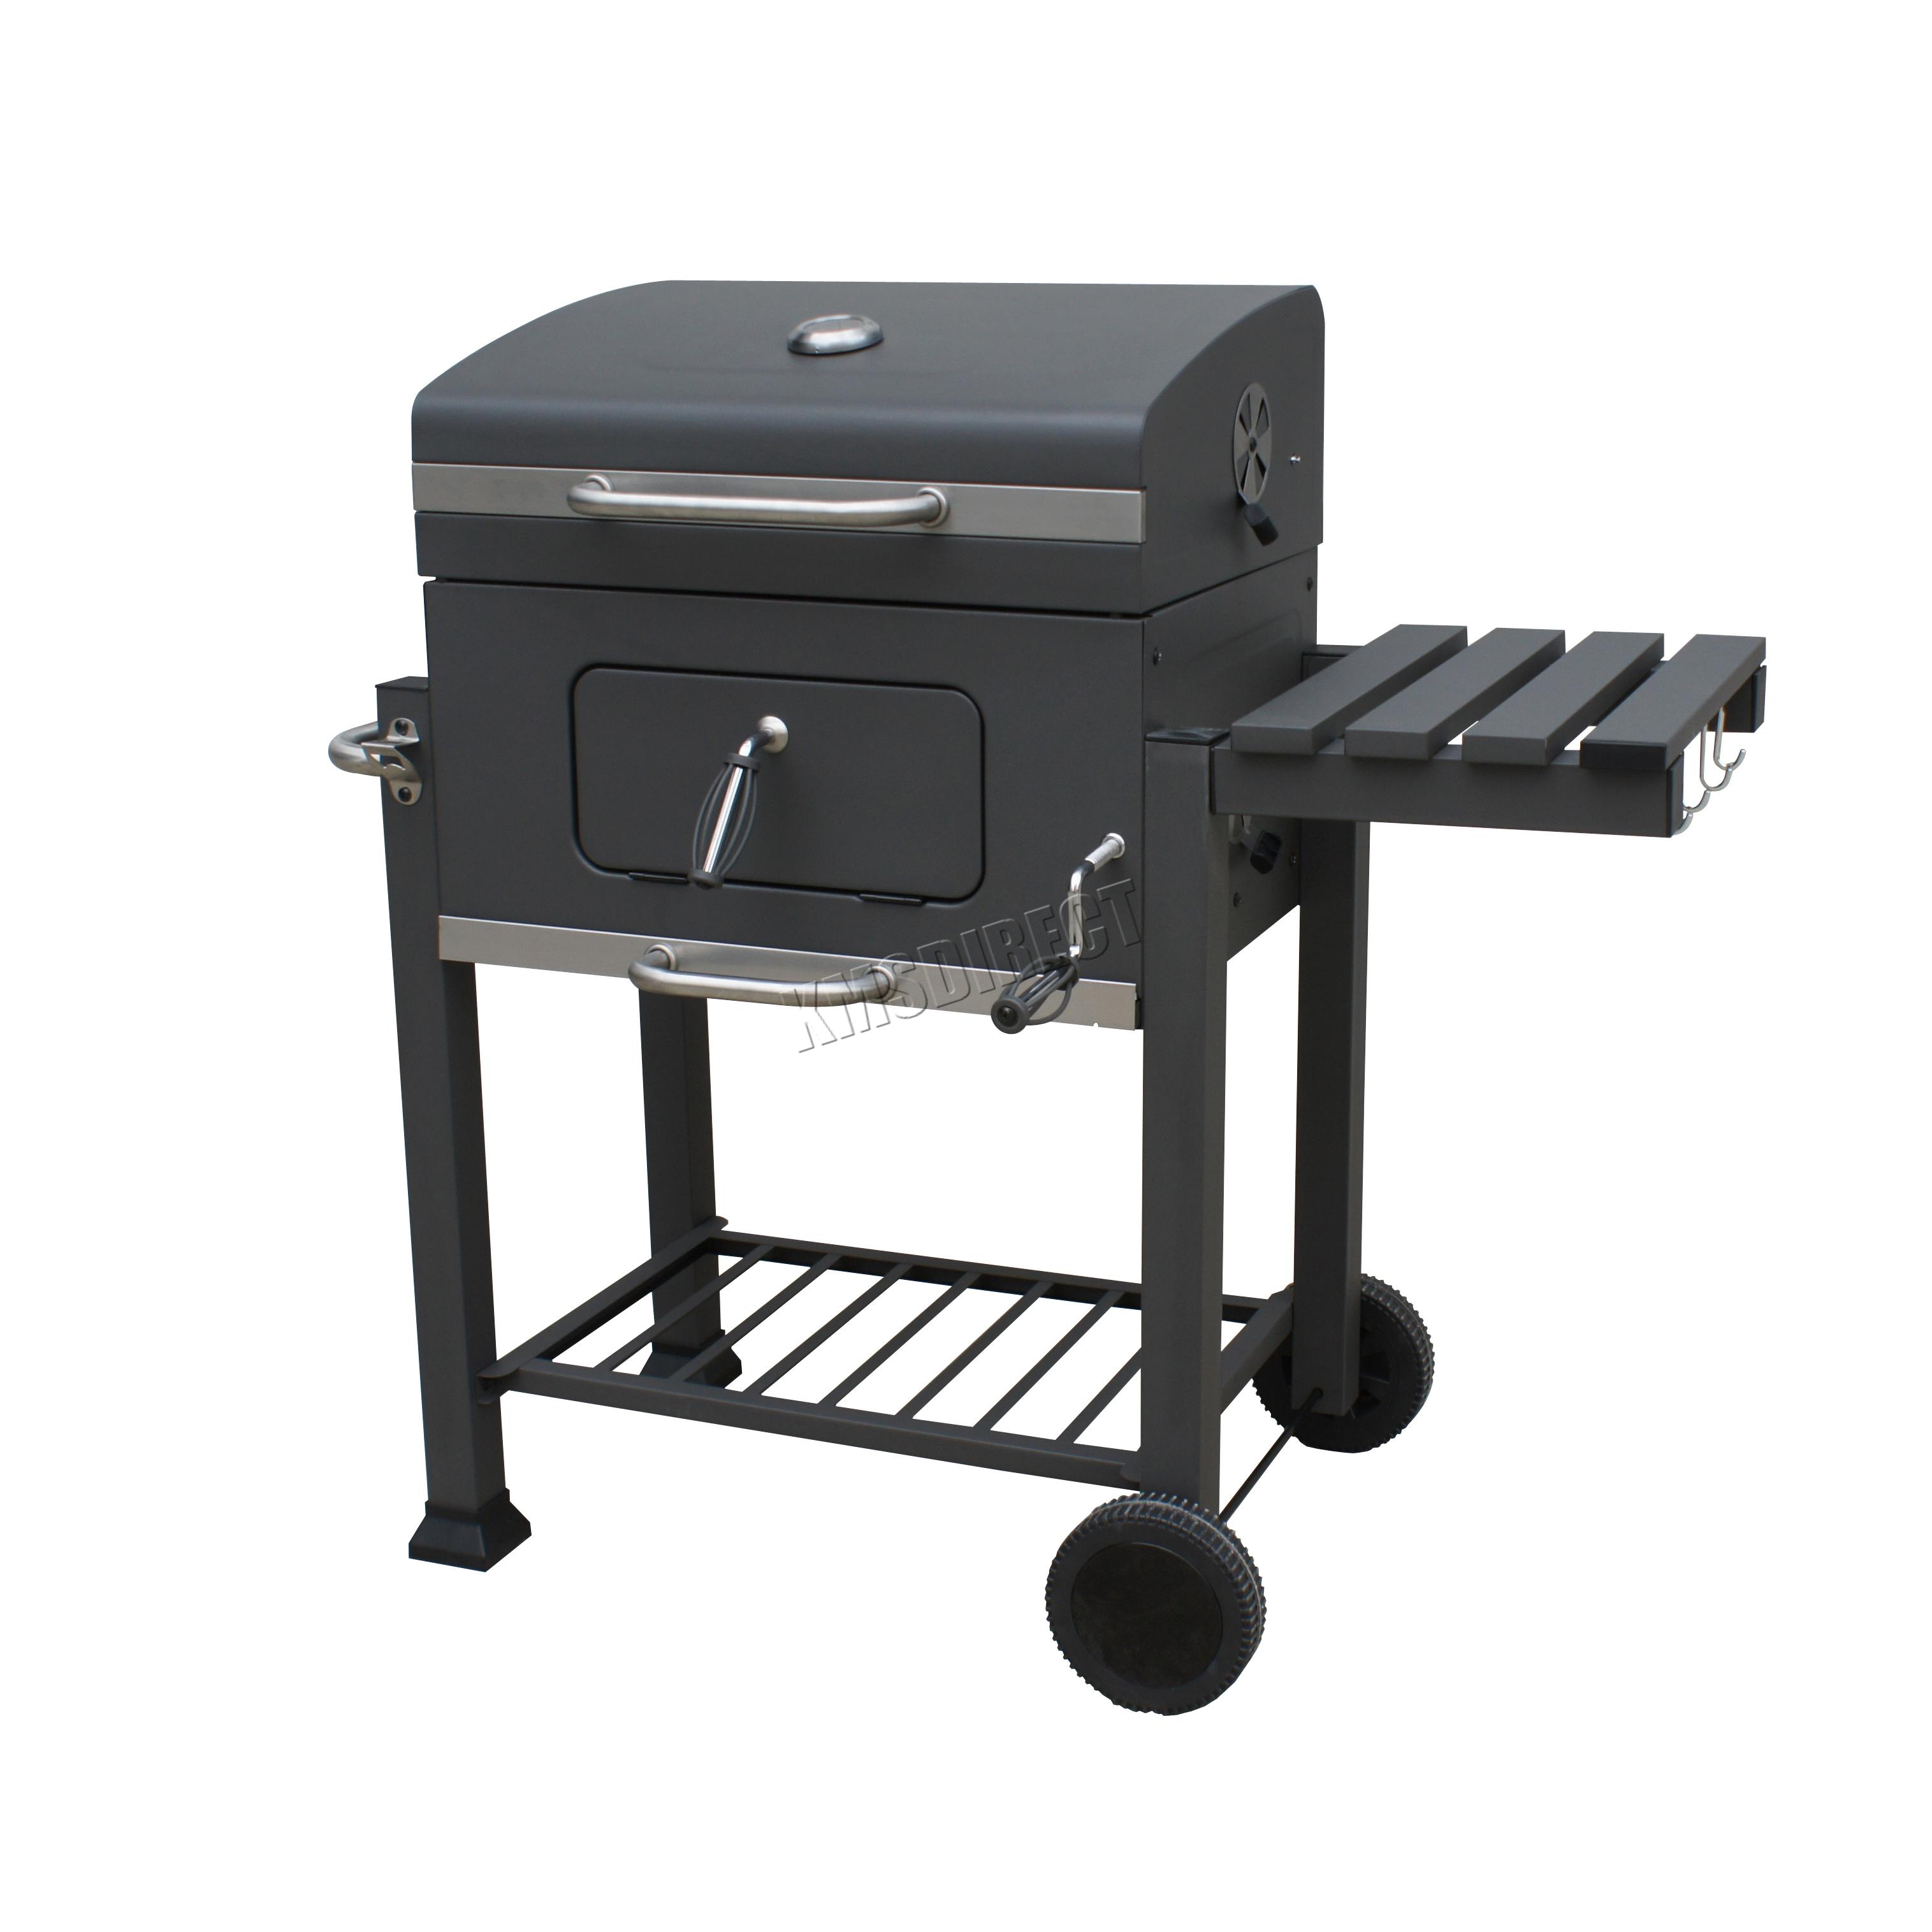 foxhunter charcoal bbq grill barbecue smoker garden portable outdoor cbg01 grey ebay. Black Bedroom Furniture Sets. Home Design Ideas